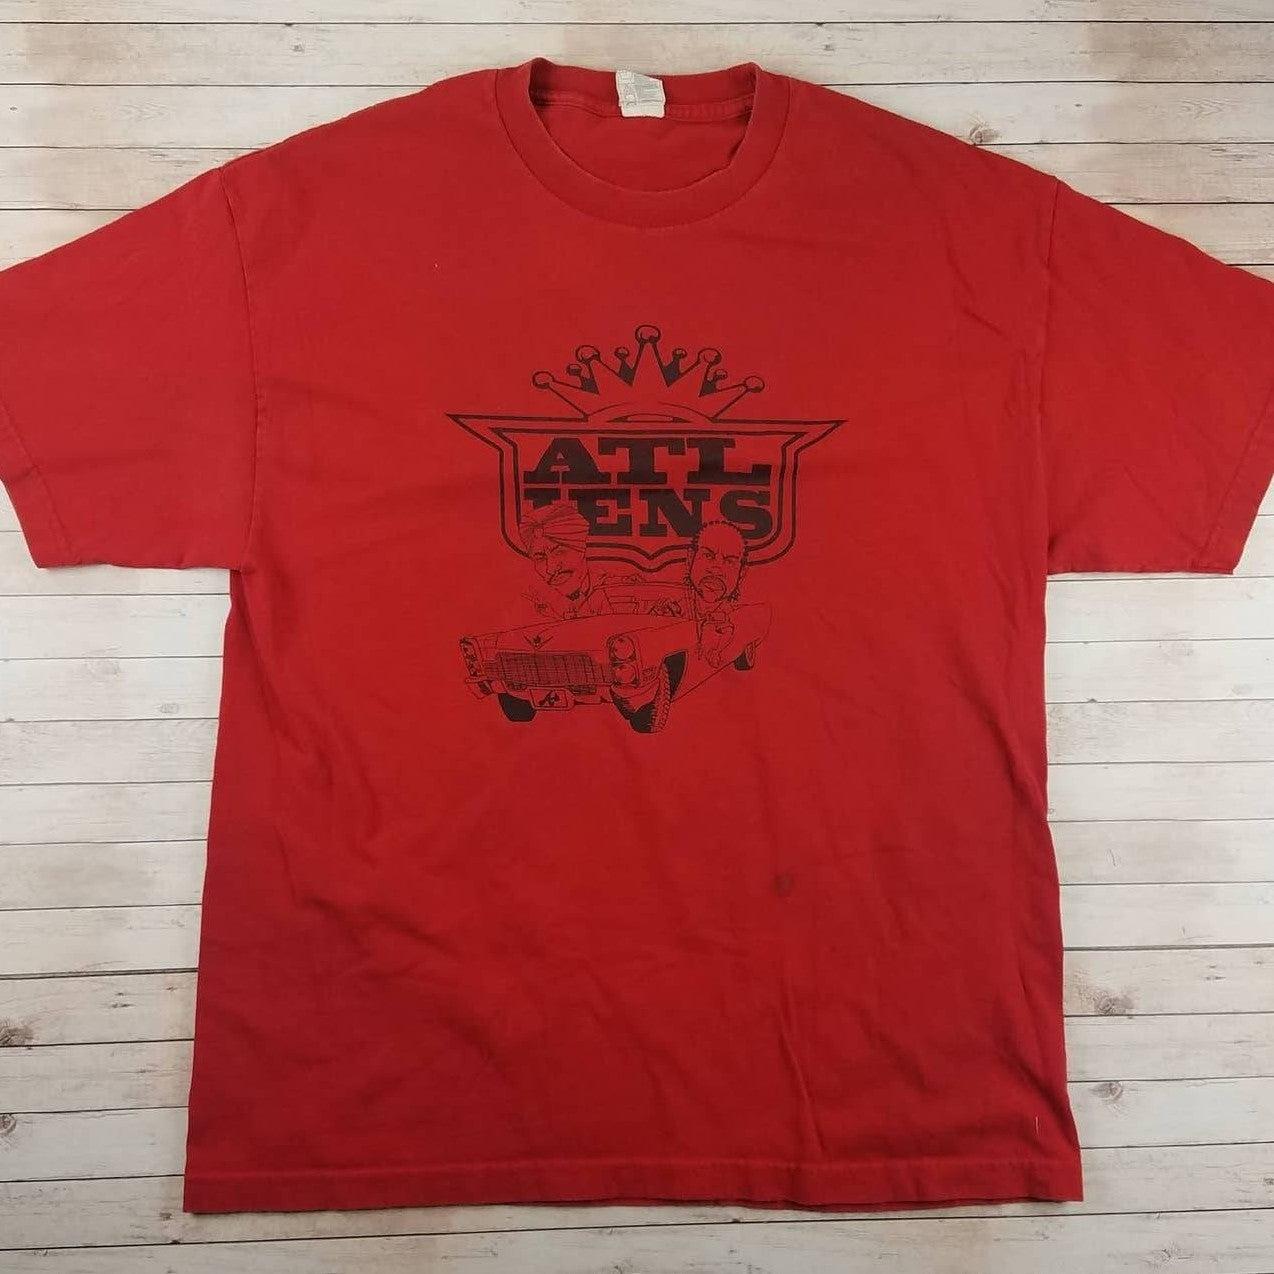 VTG 90s Outkast ATLiens Rap Tee Shirt